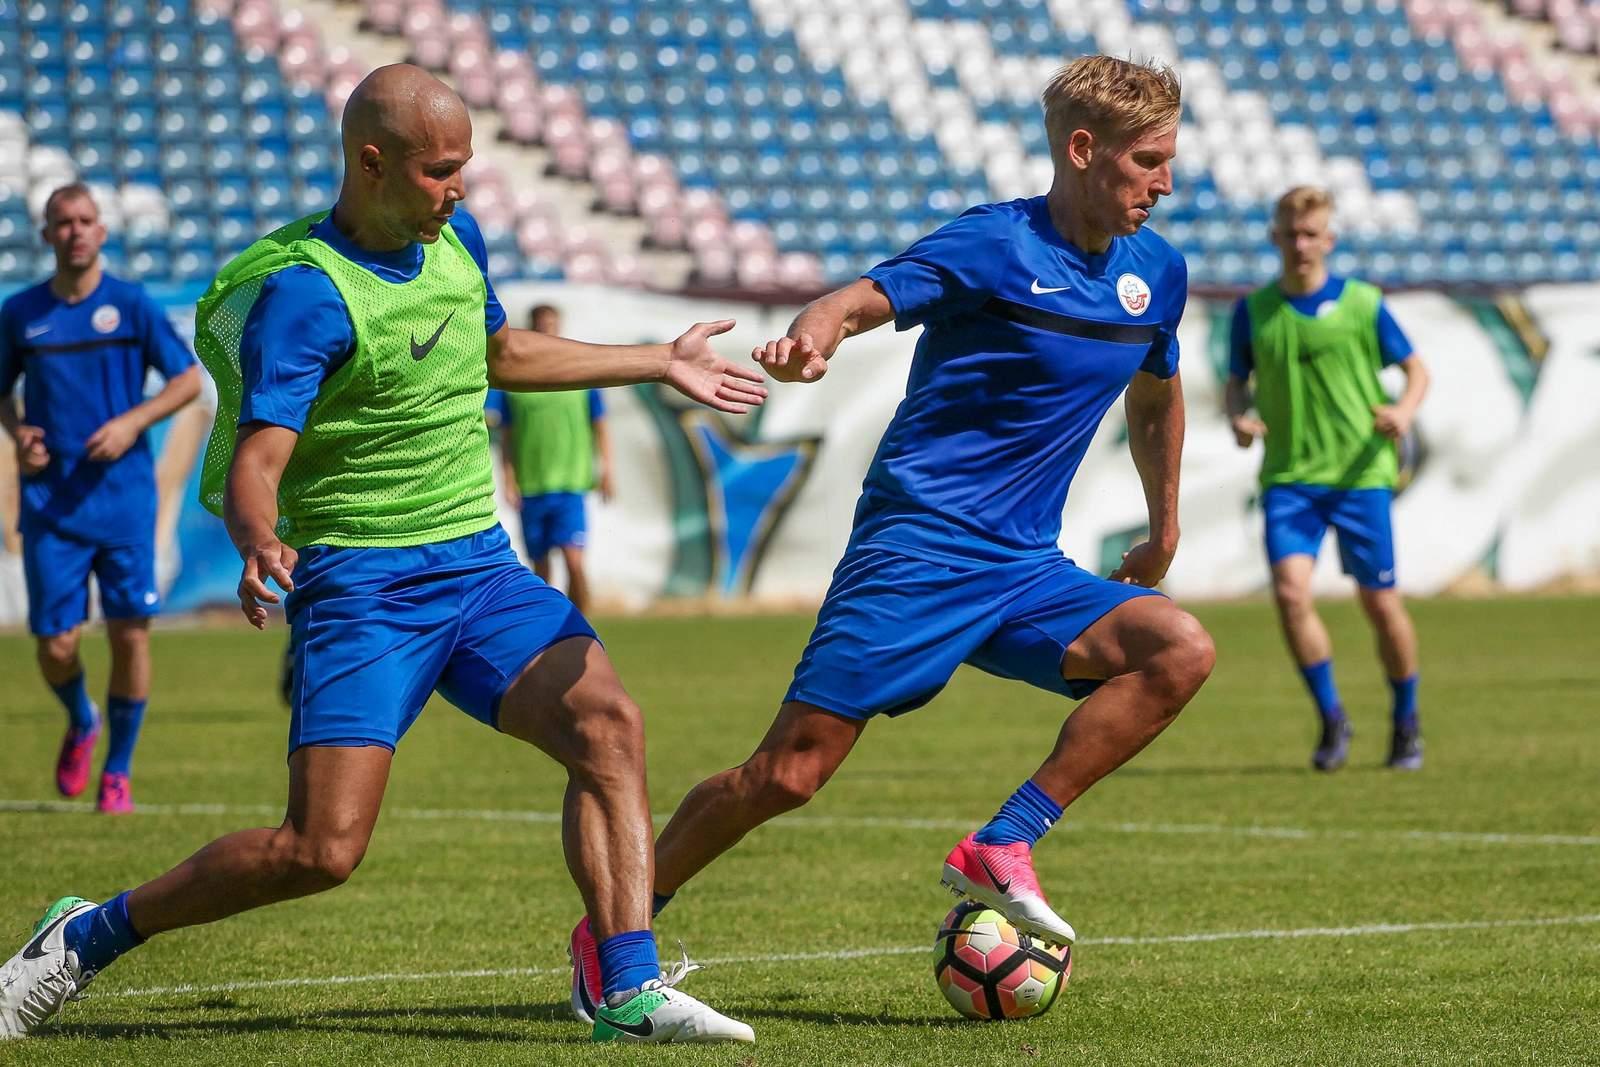 Willi Evseev im Training des FC Hansa Rostock